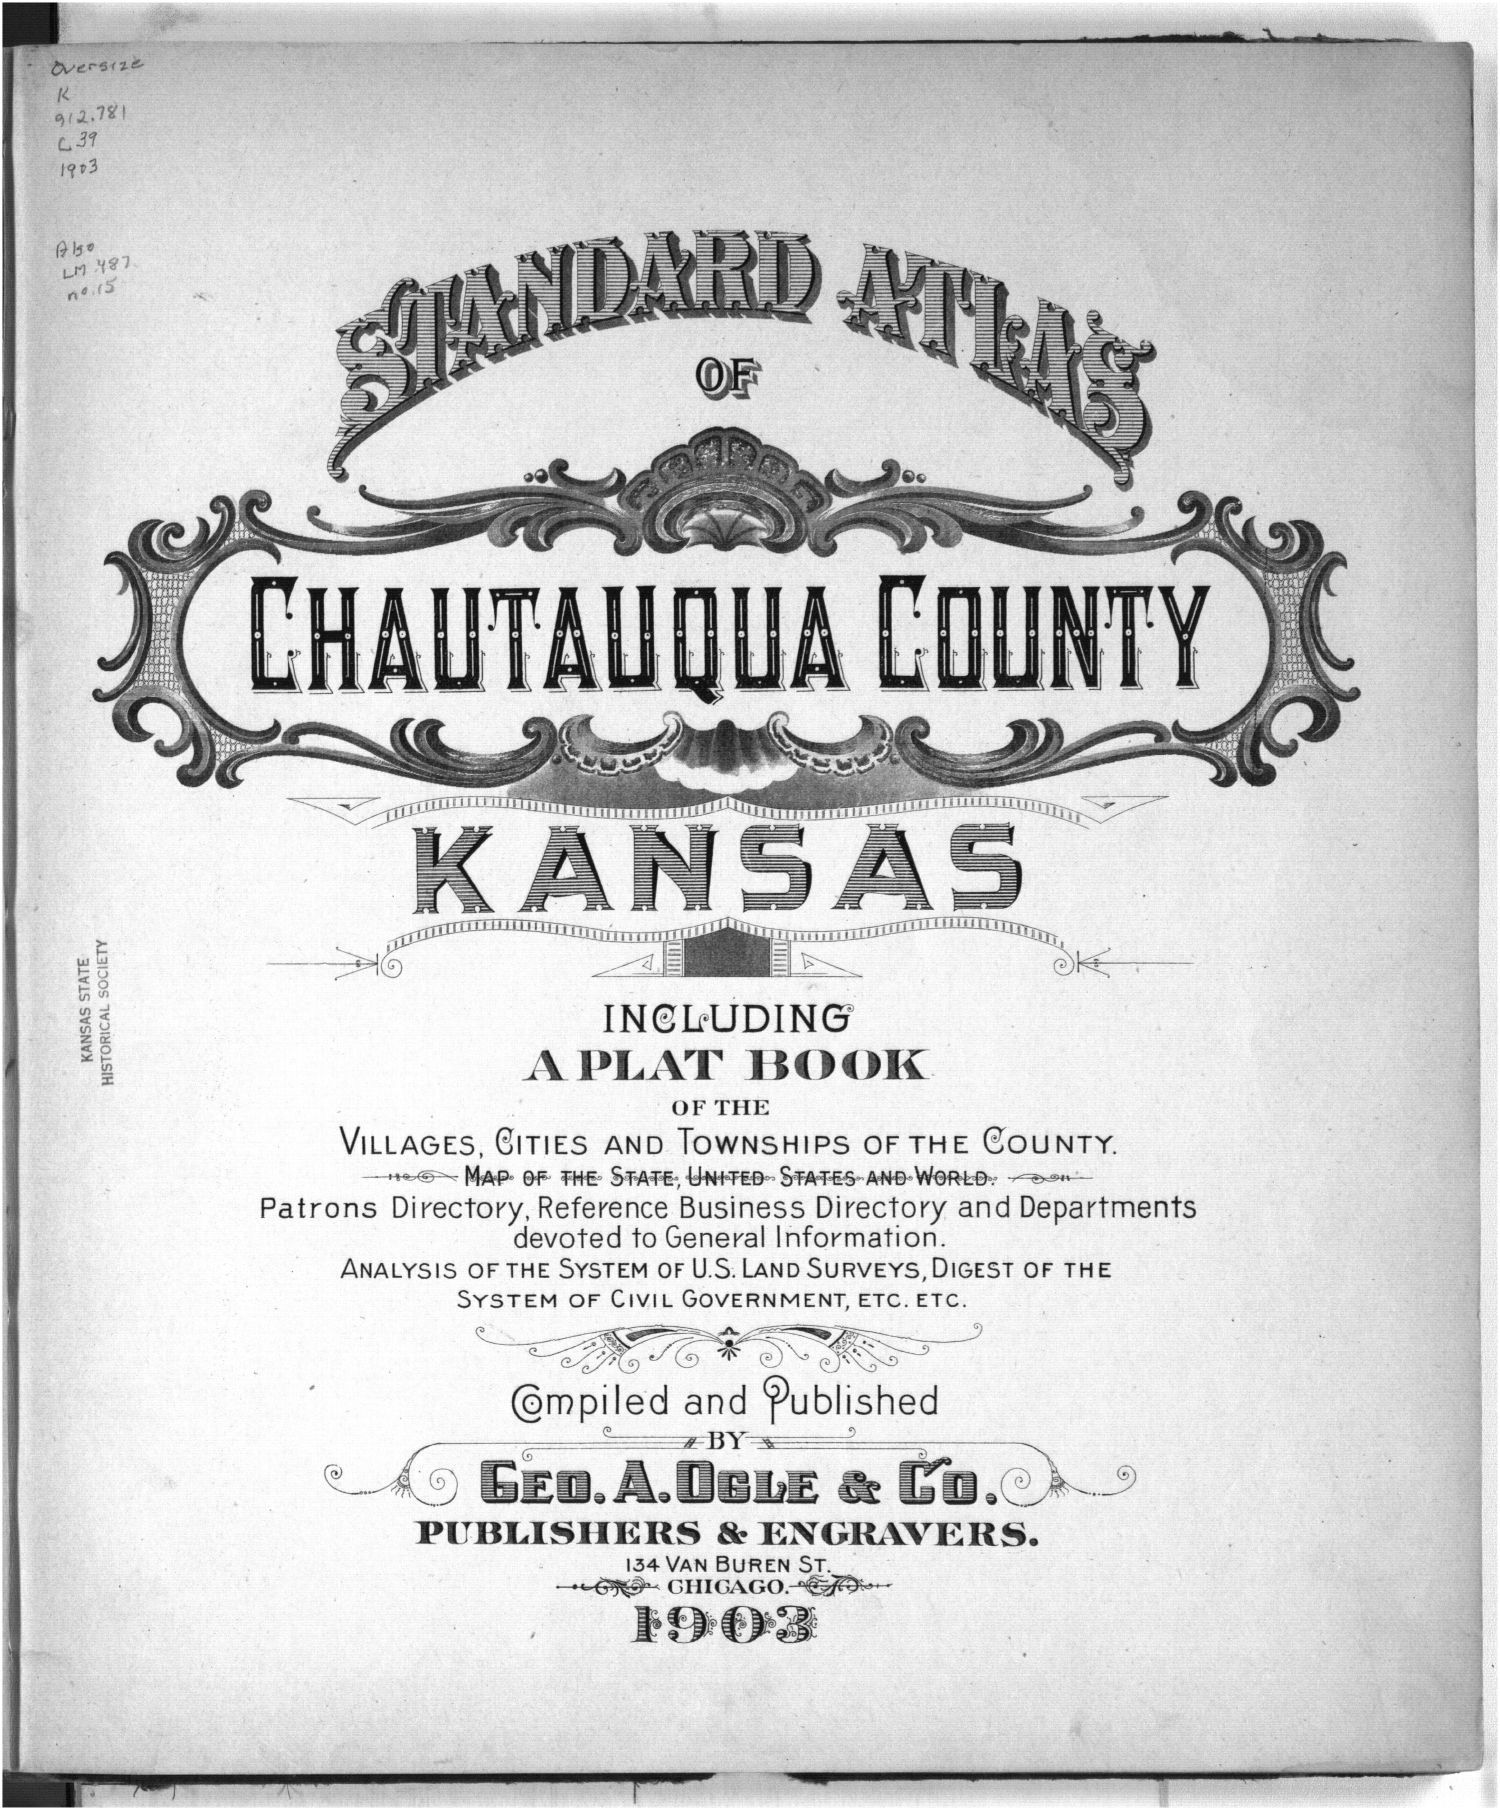 Standard atlas of Chautauqua County, Kansas - Title Page